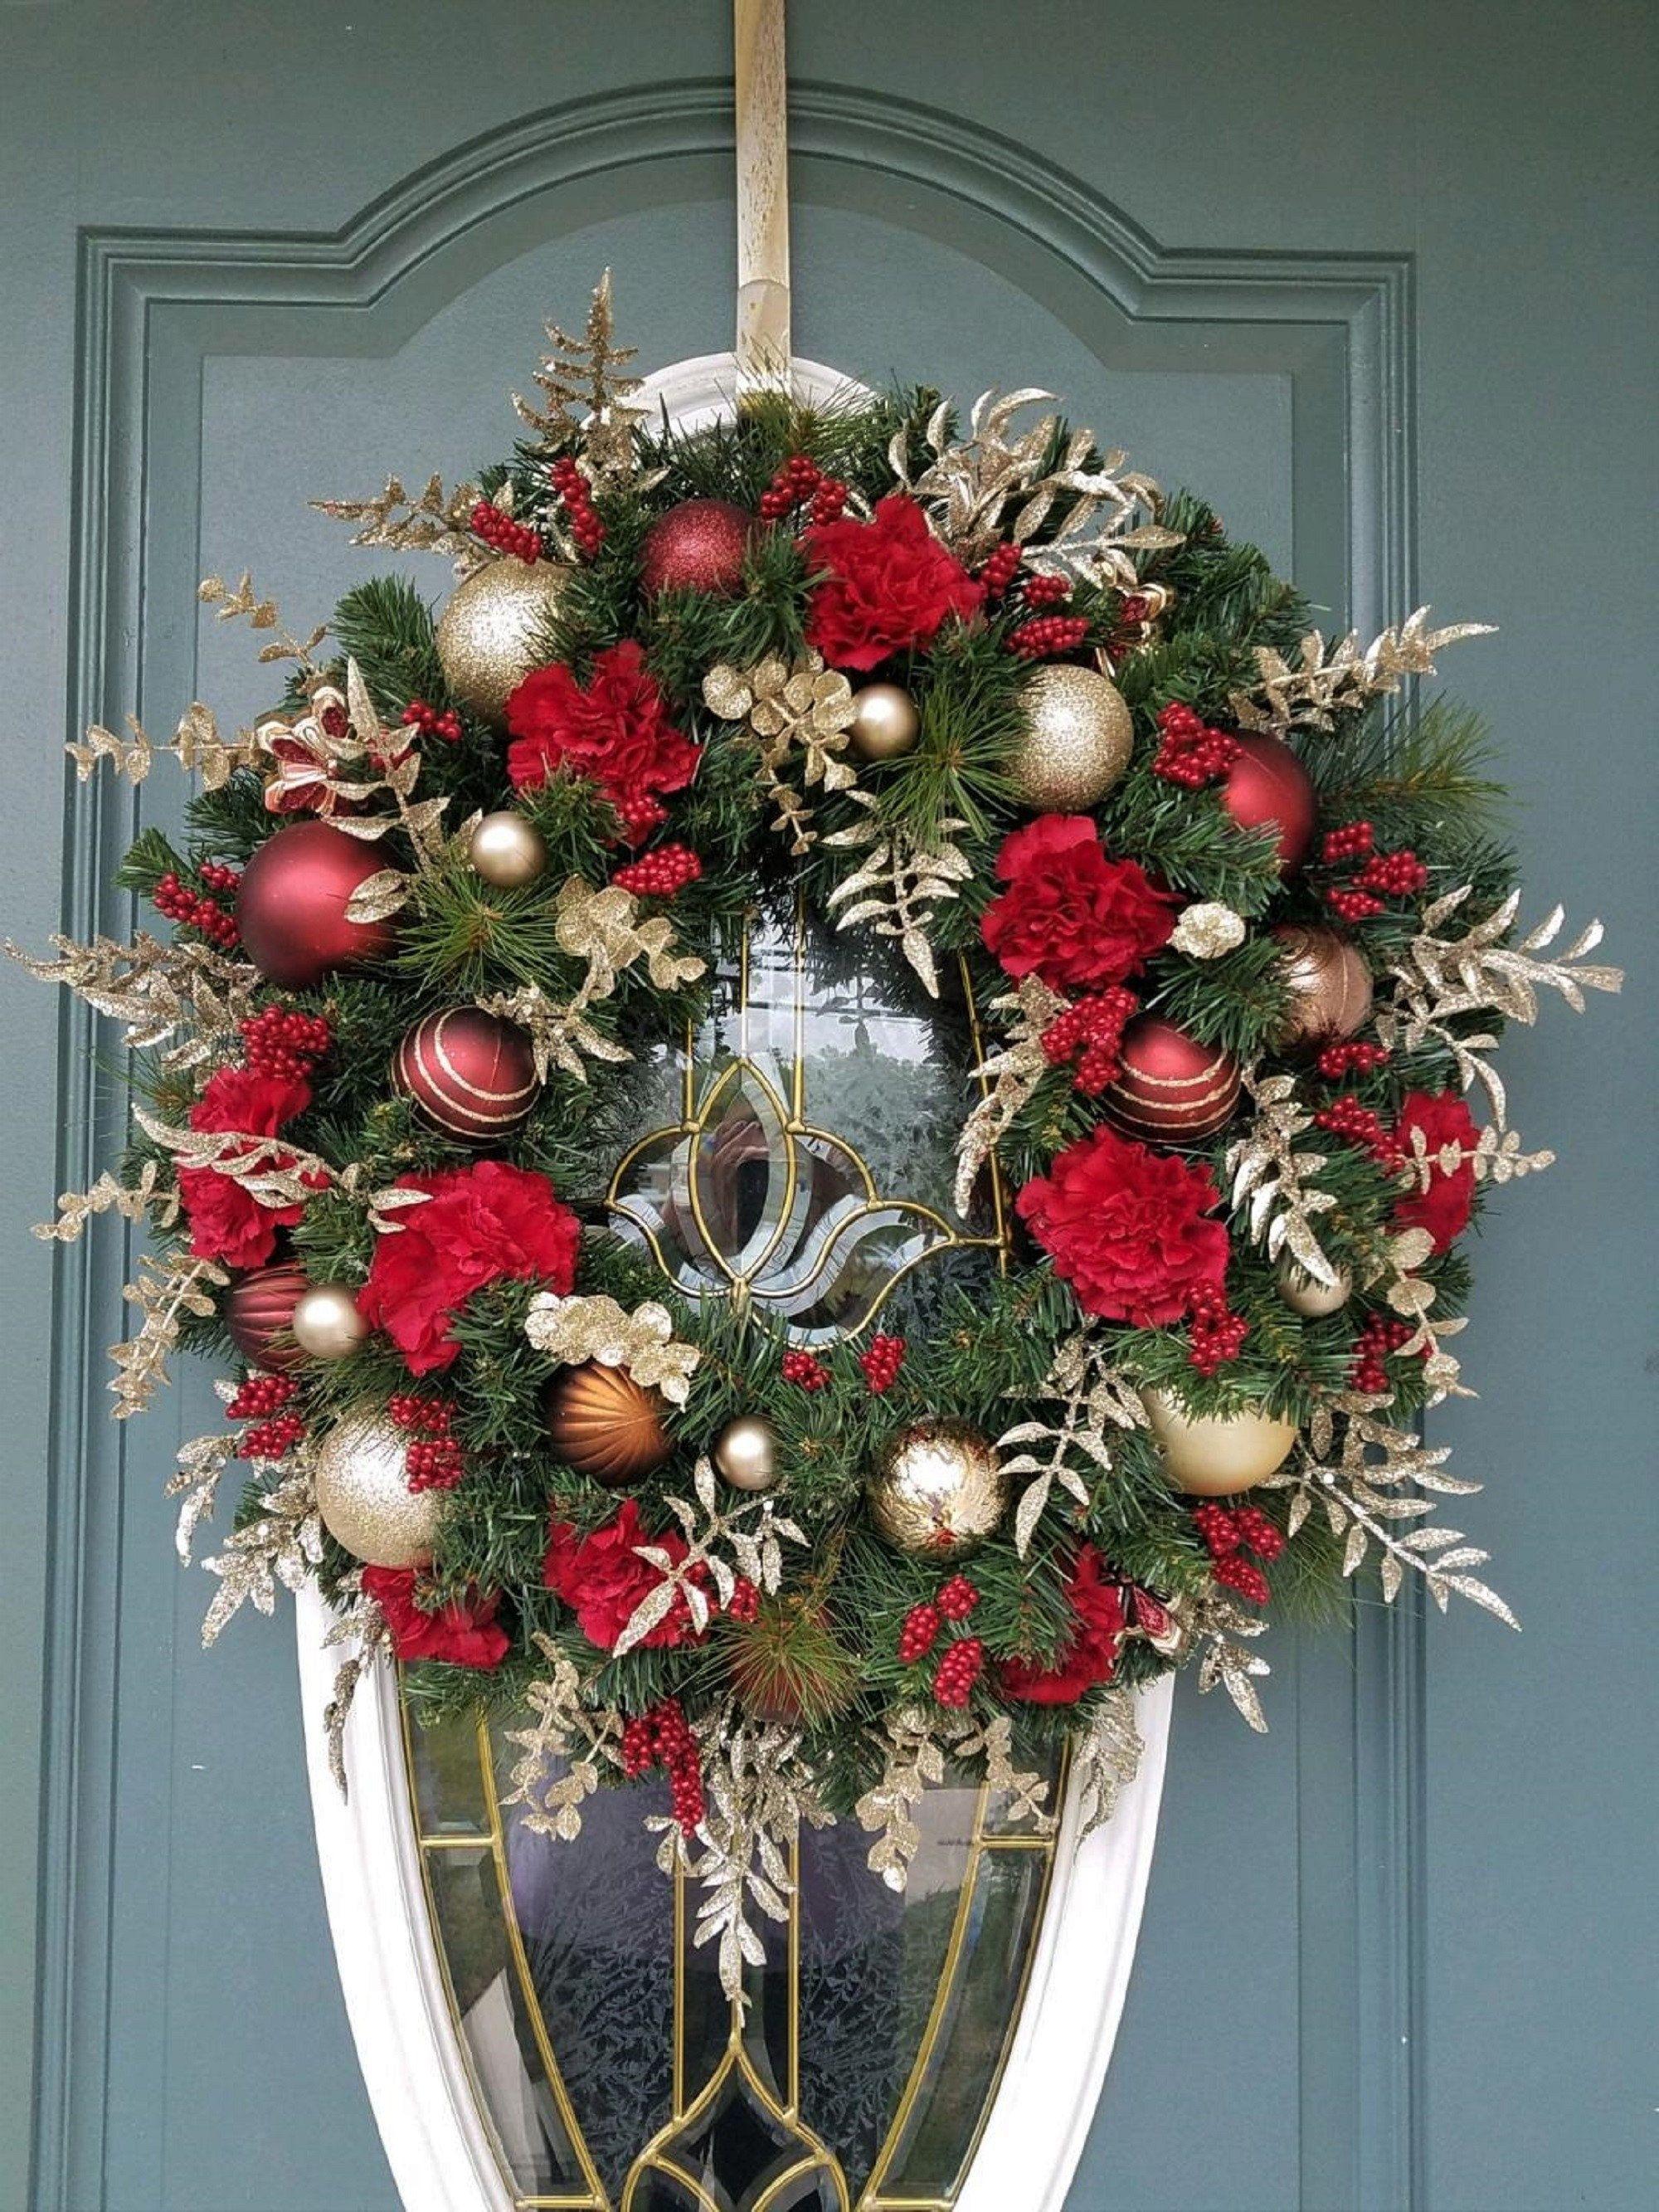 Holiday Wreath Peony Wreath 24 Inch Wreath for Door Large Wreath Front Door Wreath Porch Decor Christmas Wreath Christmas Door Decor